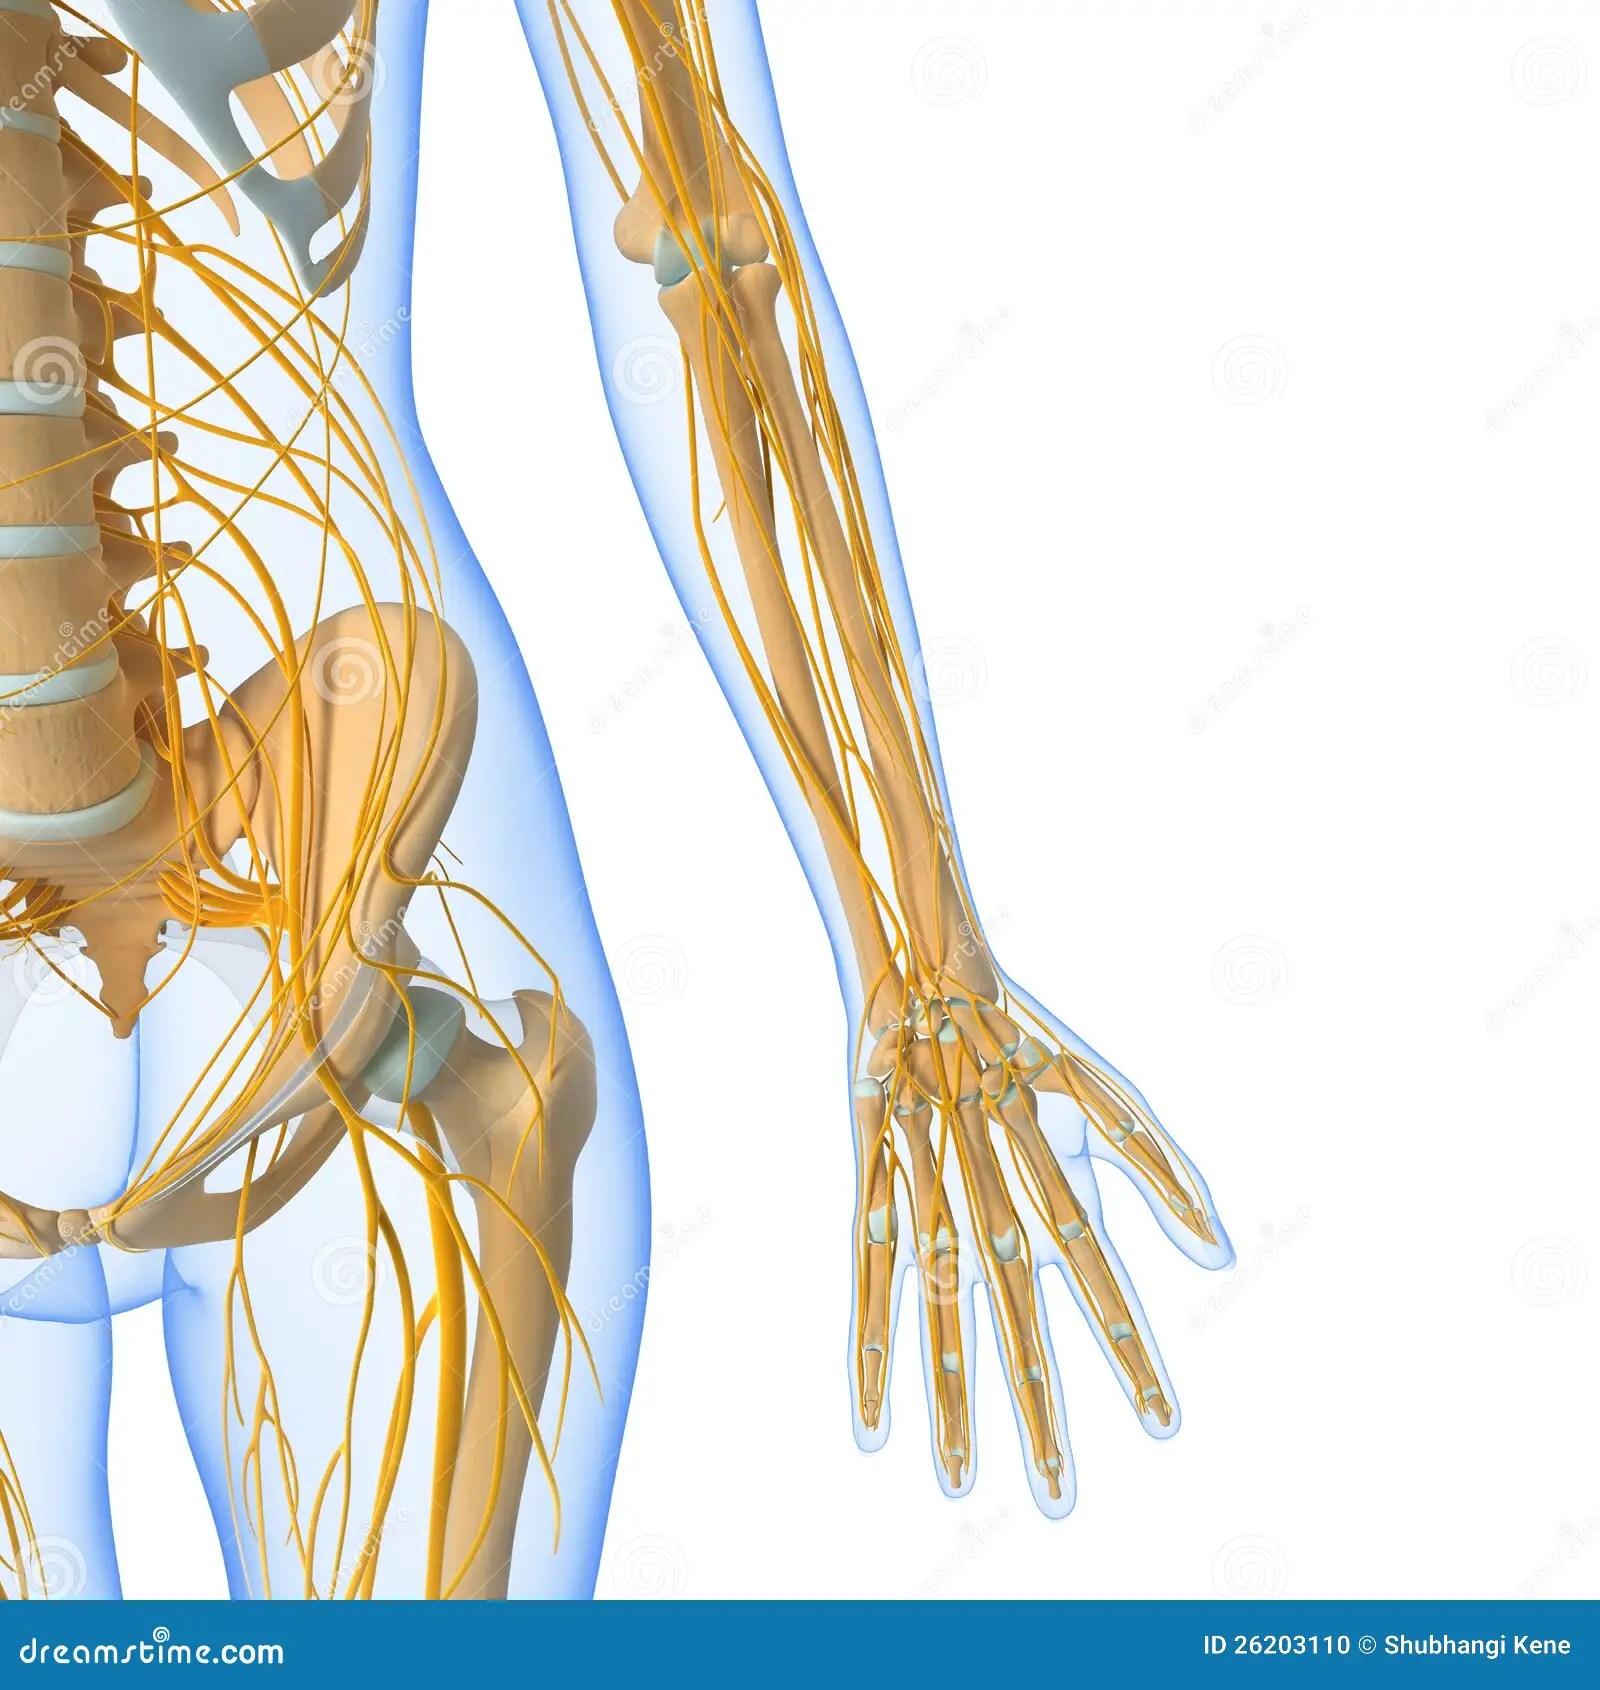 hight resolution of nervous system of female body stock illustration illustration of groin nerve diagram female nerve diagram human body